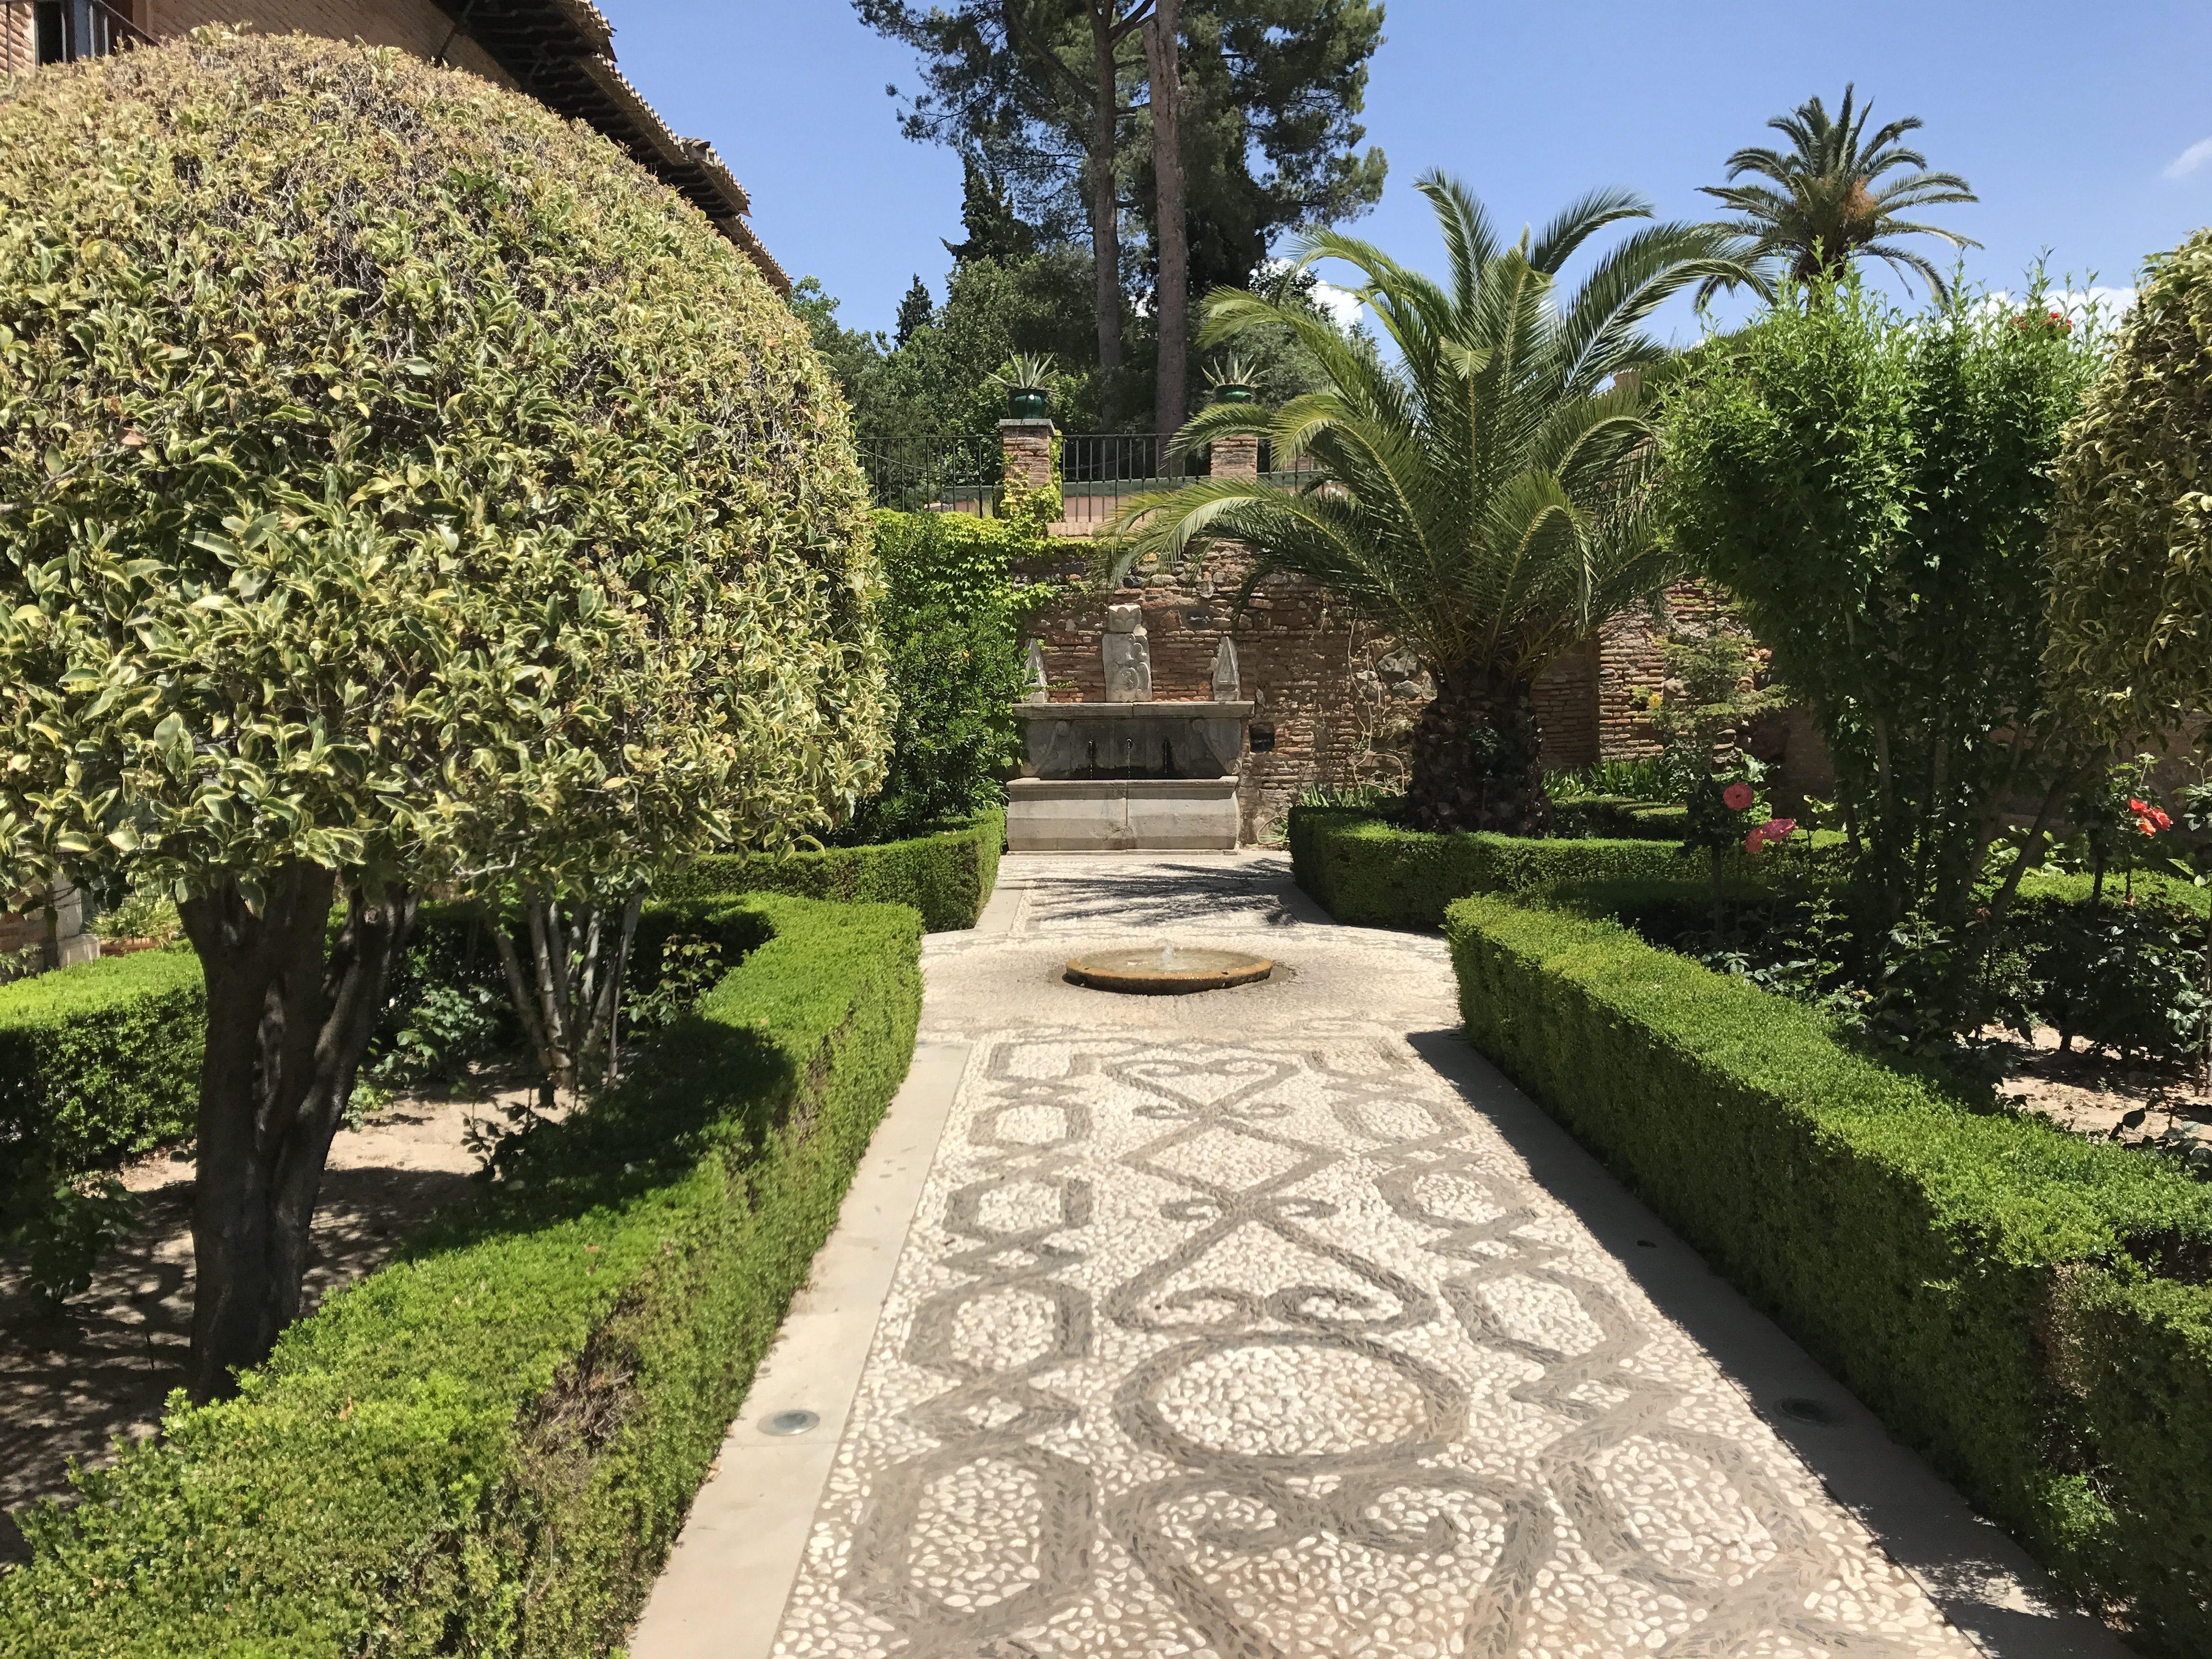 Granada - Alhambra - zelený koutek u hotelu Parador de Granada